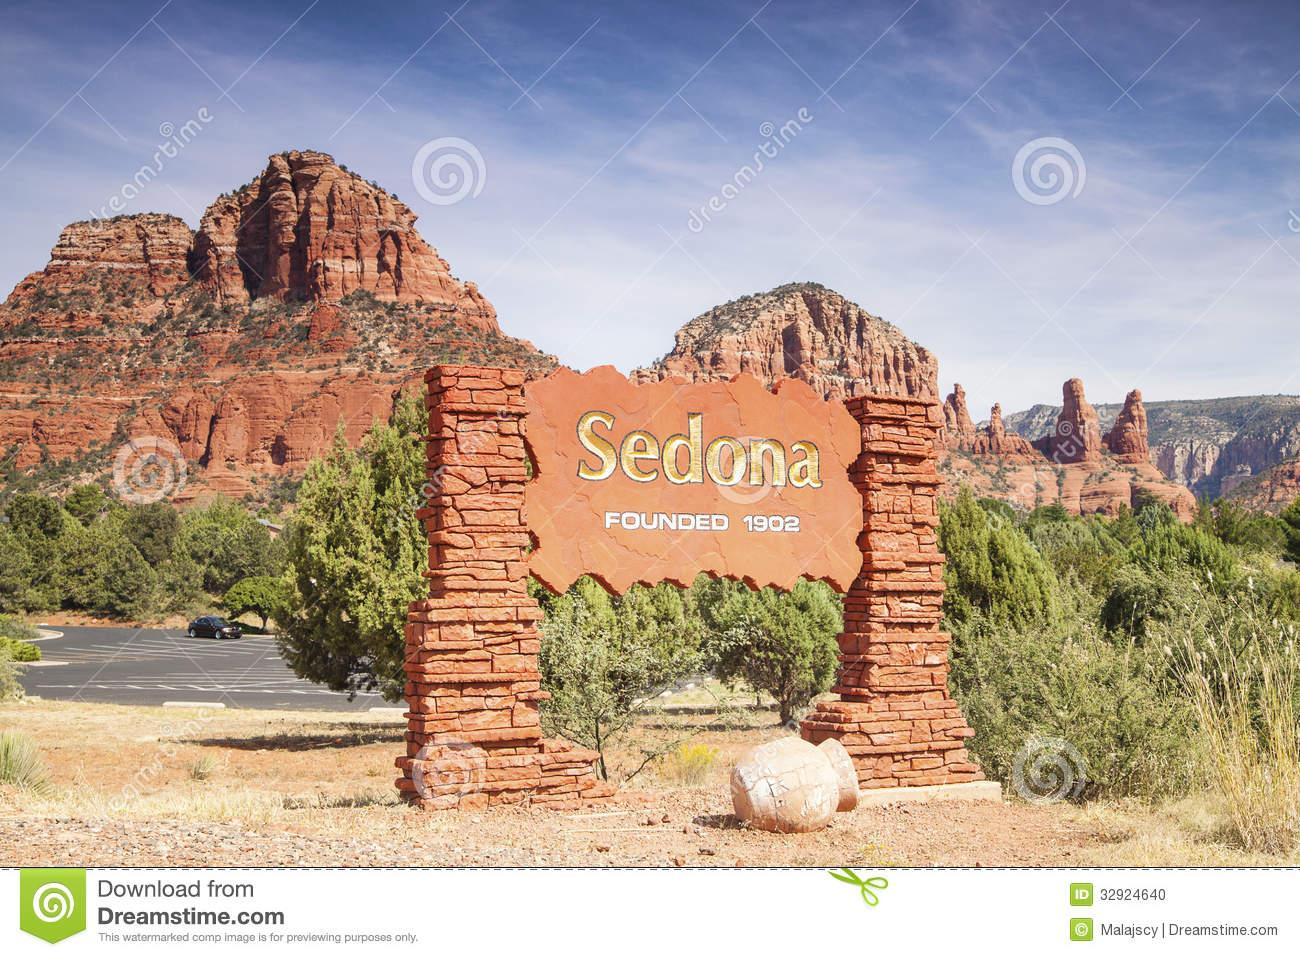 Sedona clip art.